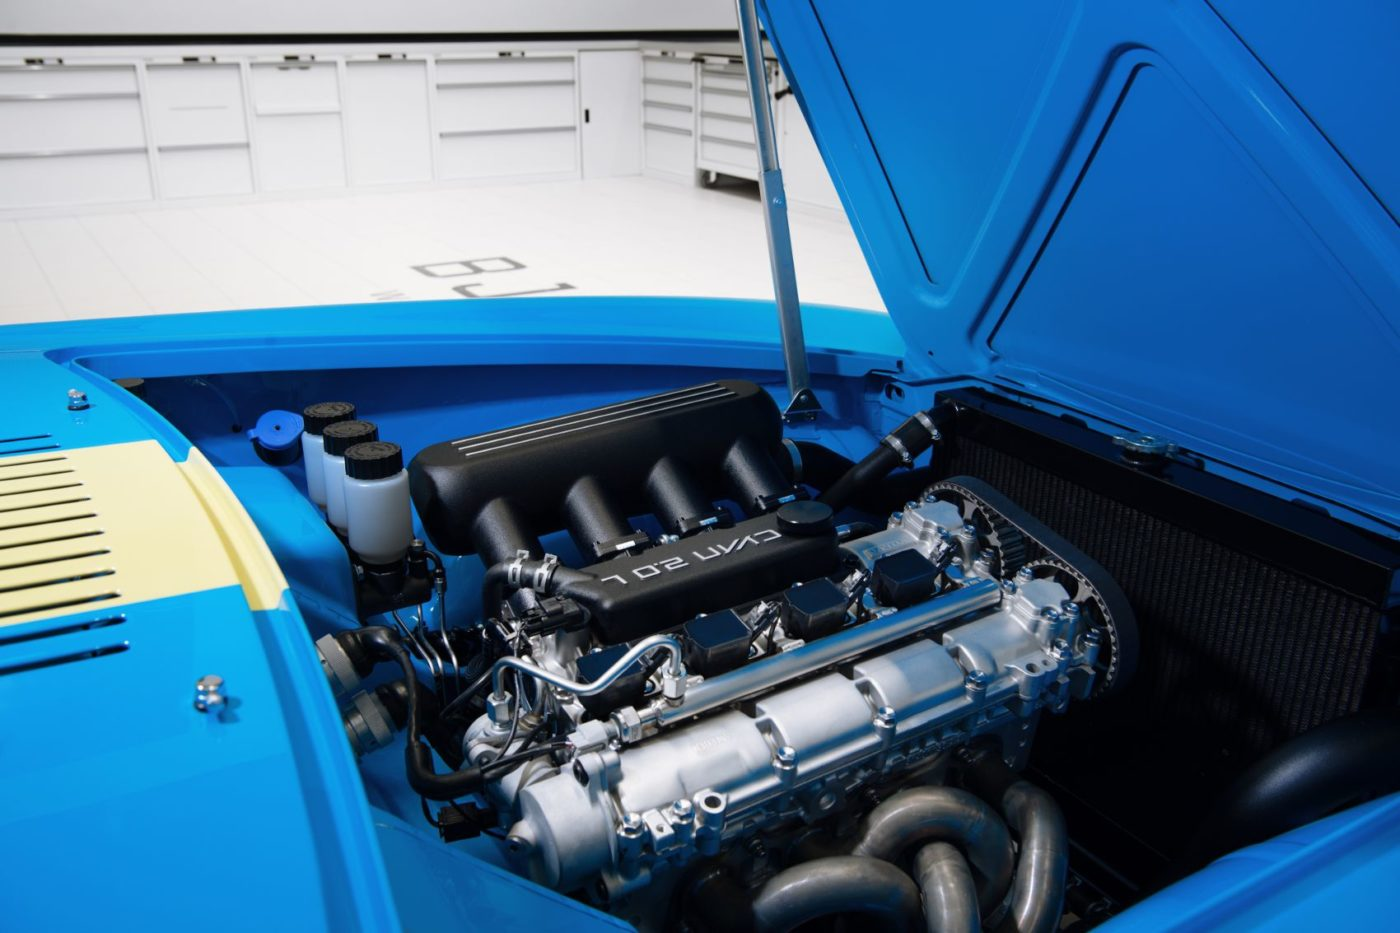 Volvo P1800 Cyan engine.